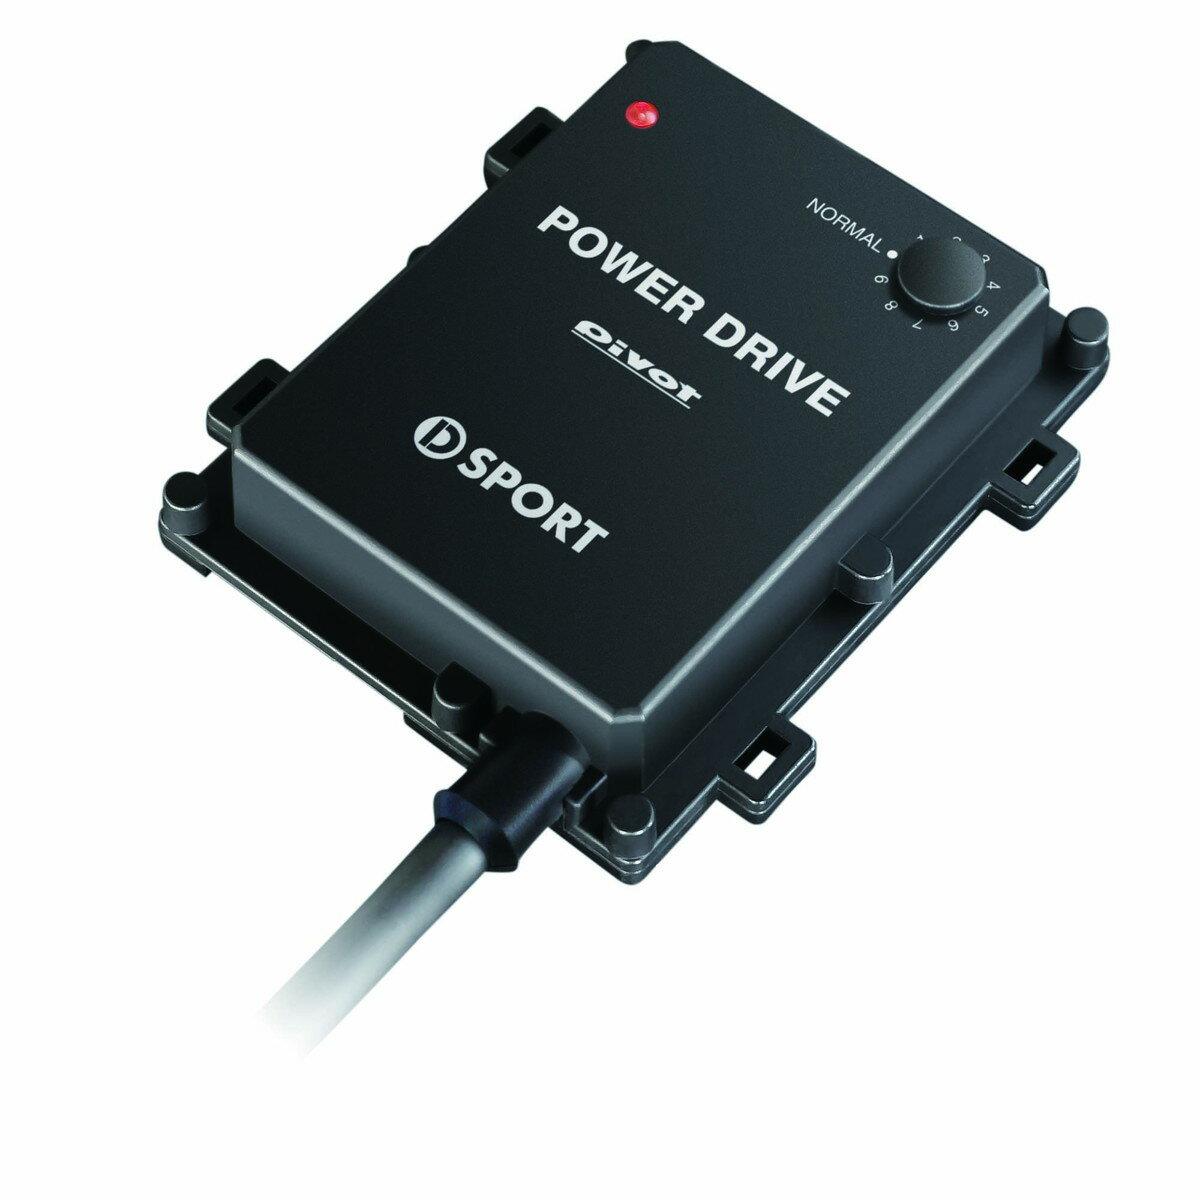 Pivot(ピボット) パワードライブ PDX-D1 (D-SPORTコラボモデル)コペン LA400K キャスト LA250S/LS260Sムーヴ LA150S/LA160Sタント LA600S/LA610S品番:89561-E240